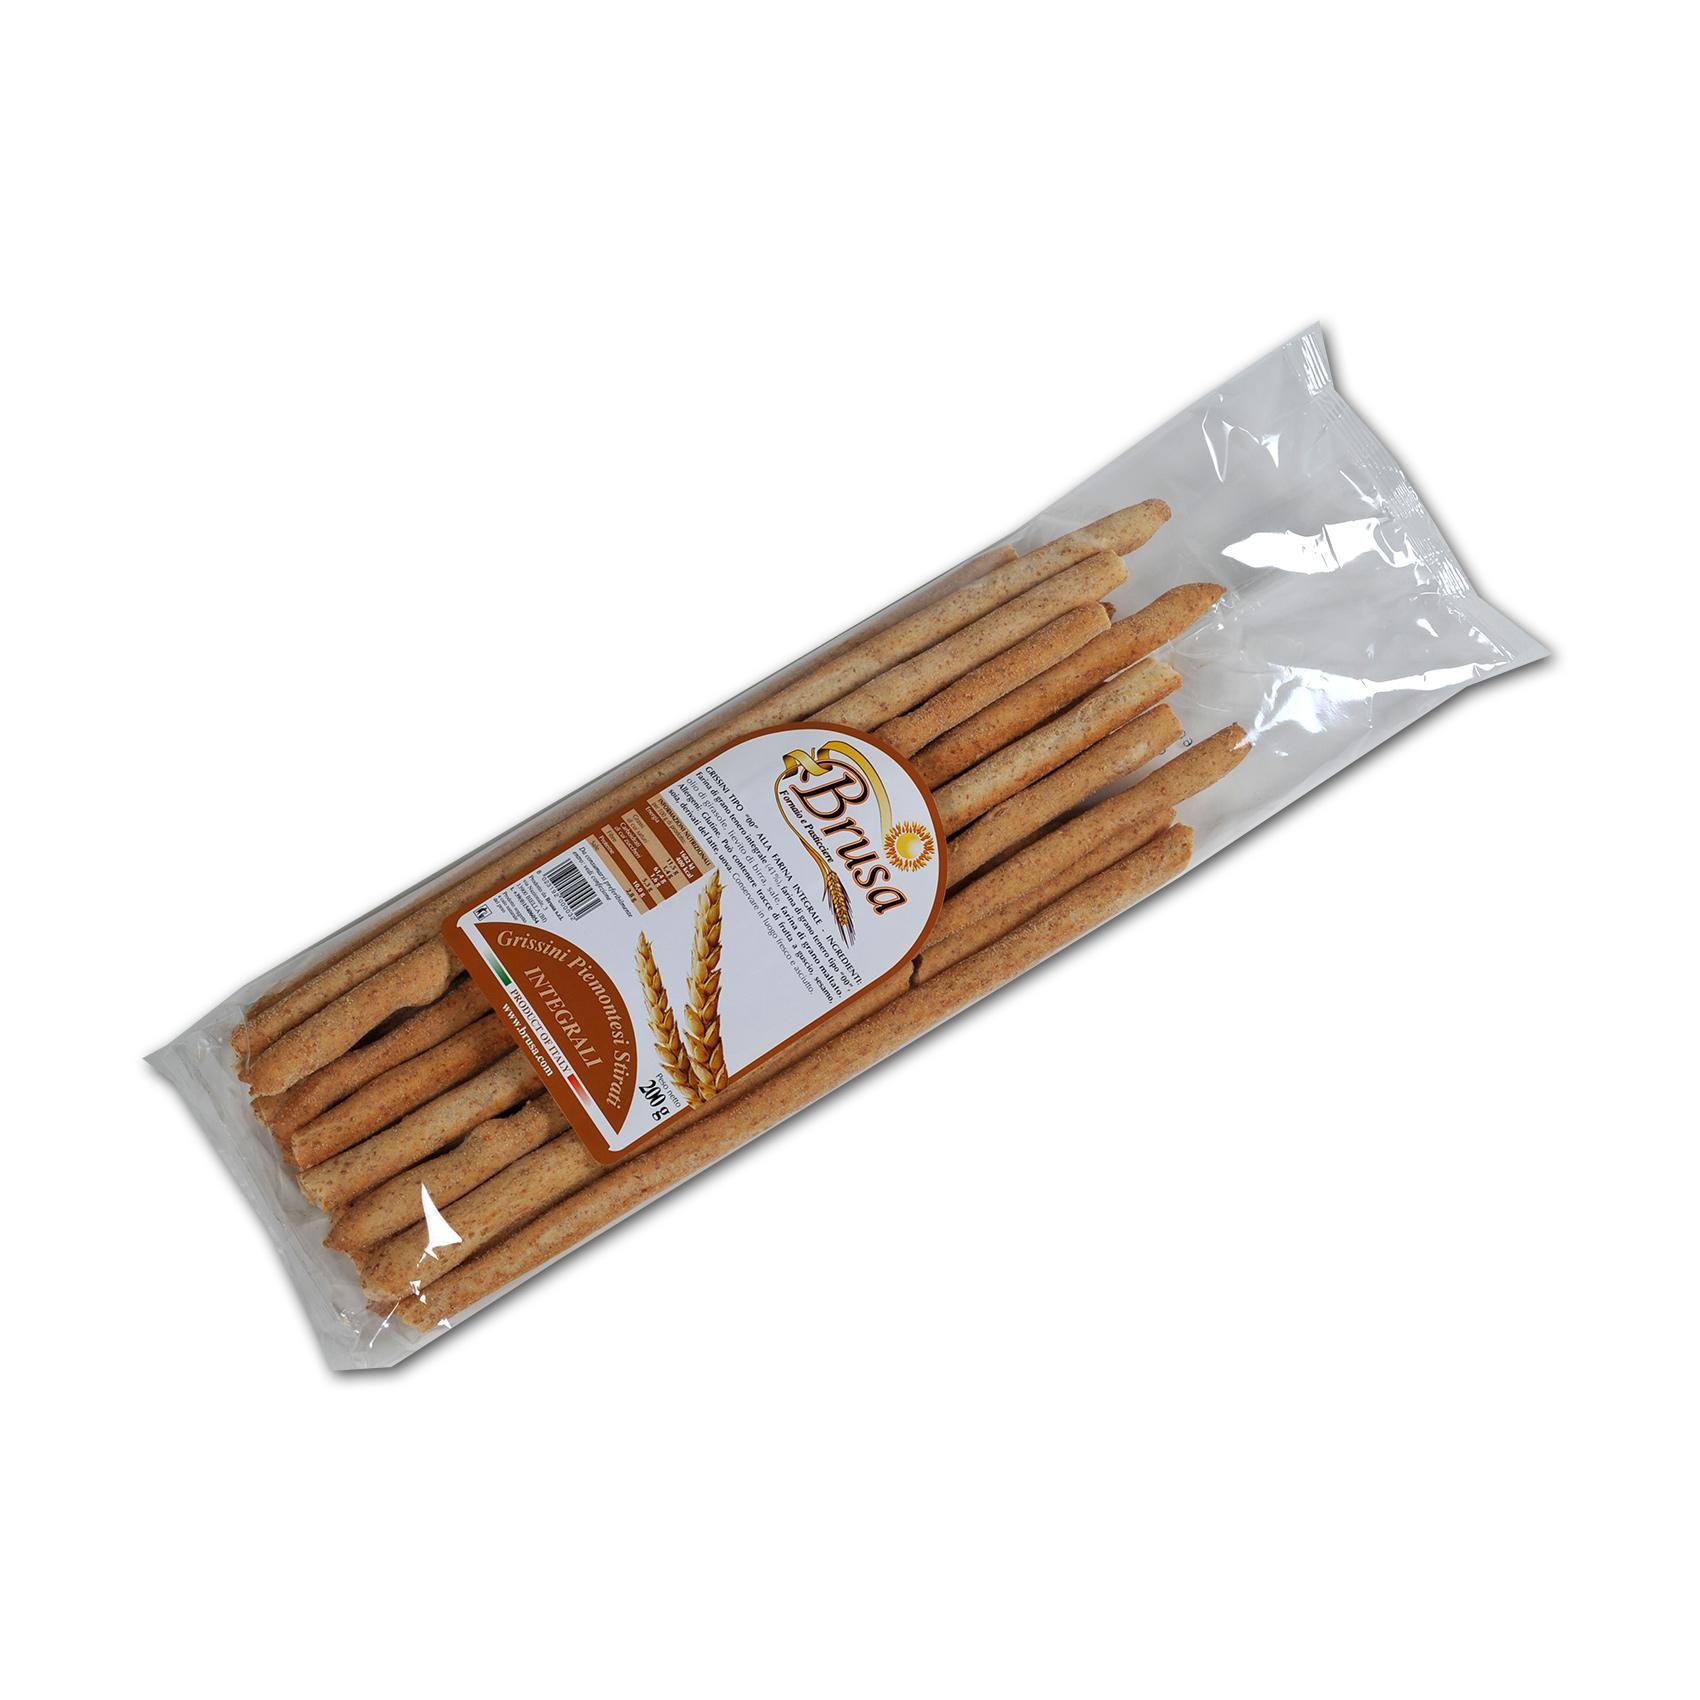 grissini-piemontesi皮埃蒙特全麦面包条-200g